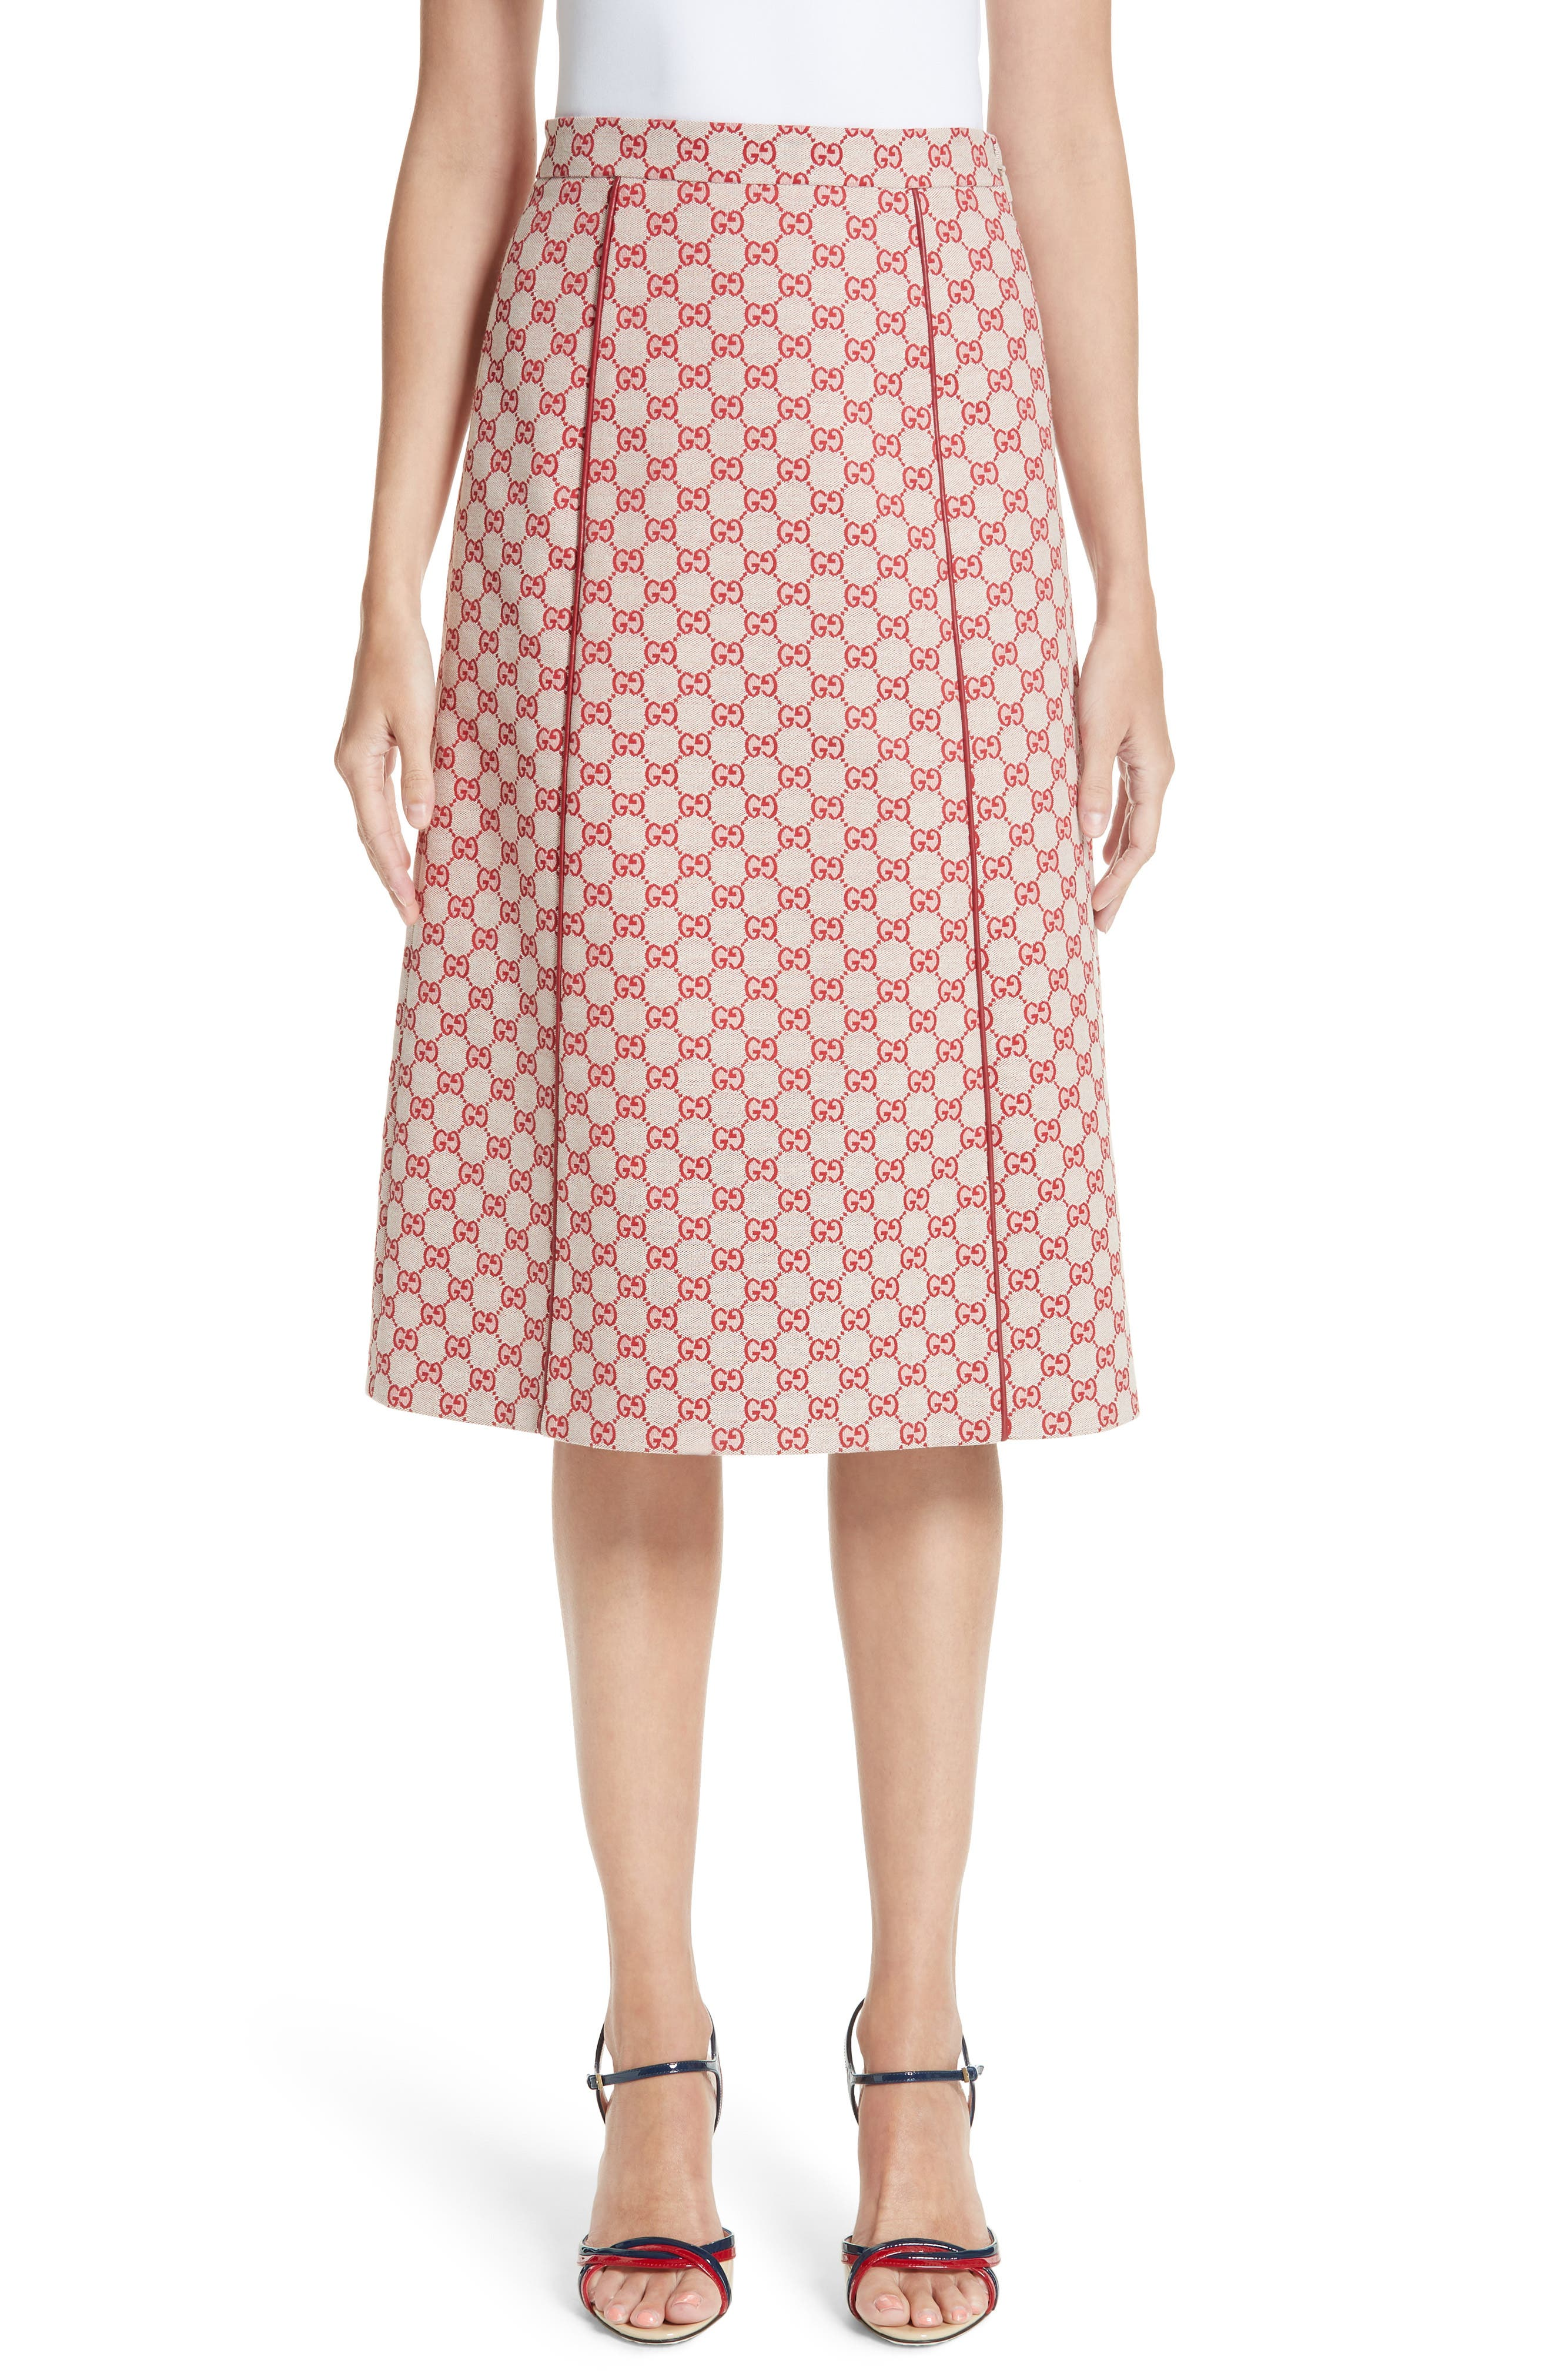 GG Print Canvas A-Line Skirt,                             Main thumbnail 1, color,                             GARDENIA/ HIBISCUS RED